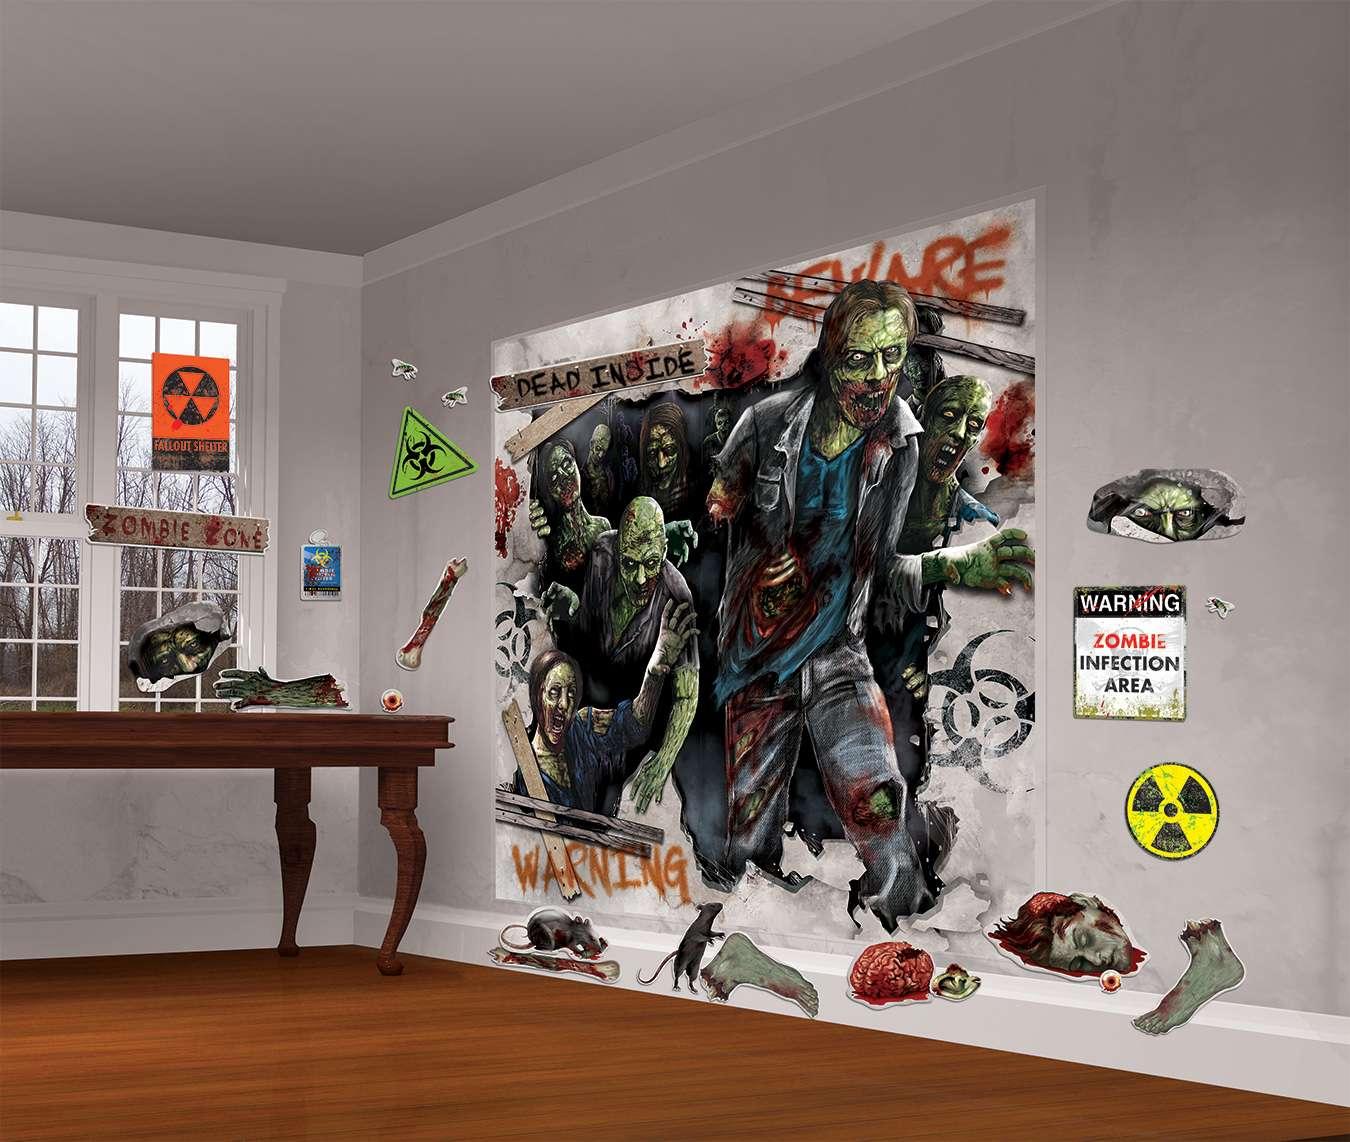 horror zombie zone xxl indoor wanddekoration 165x165cm 17Mfi4HGhlT54e 1280x1280 2x